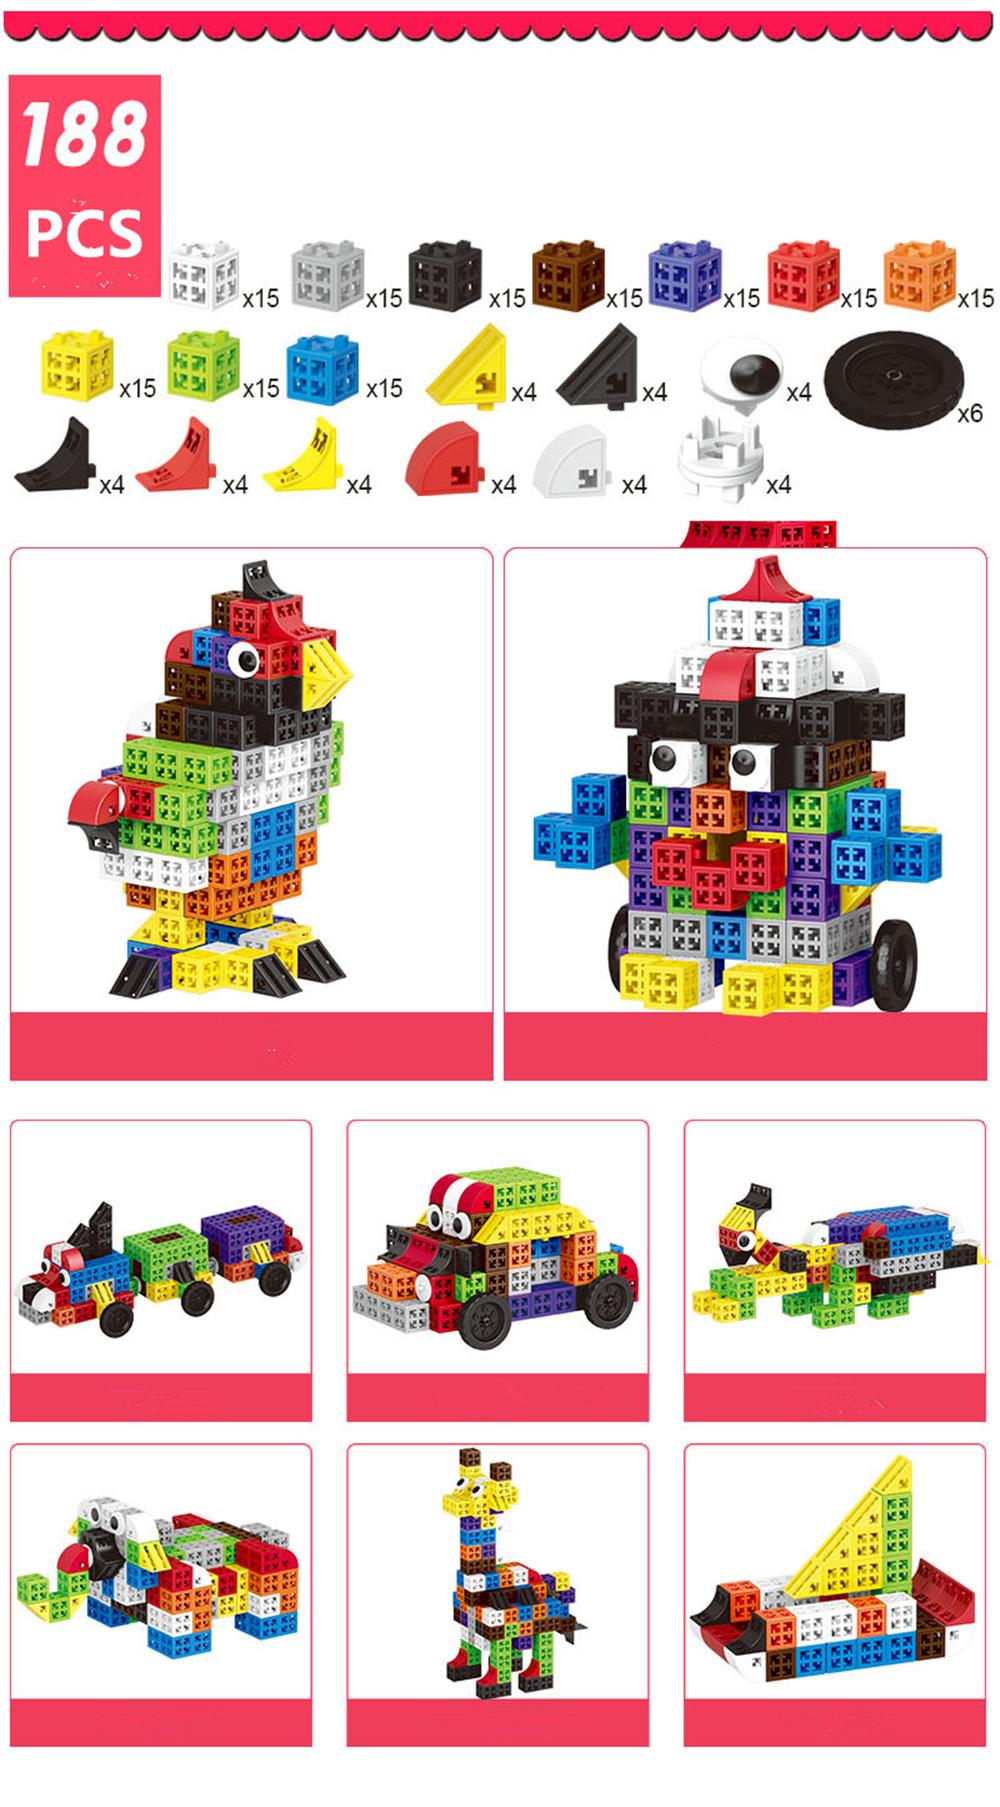 34/48/88/138/188pcs Blocks Cubes Unit Plastic Interlocking Construction Model Building Set of Early Educational Toys For Child 15